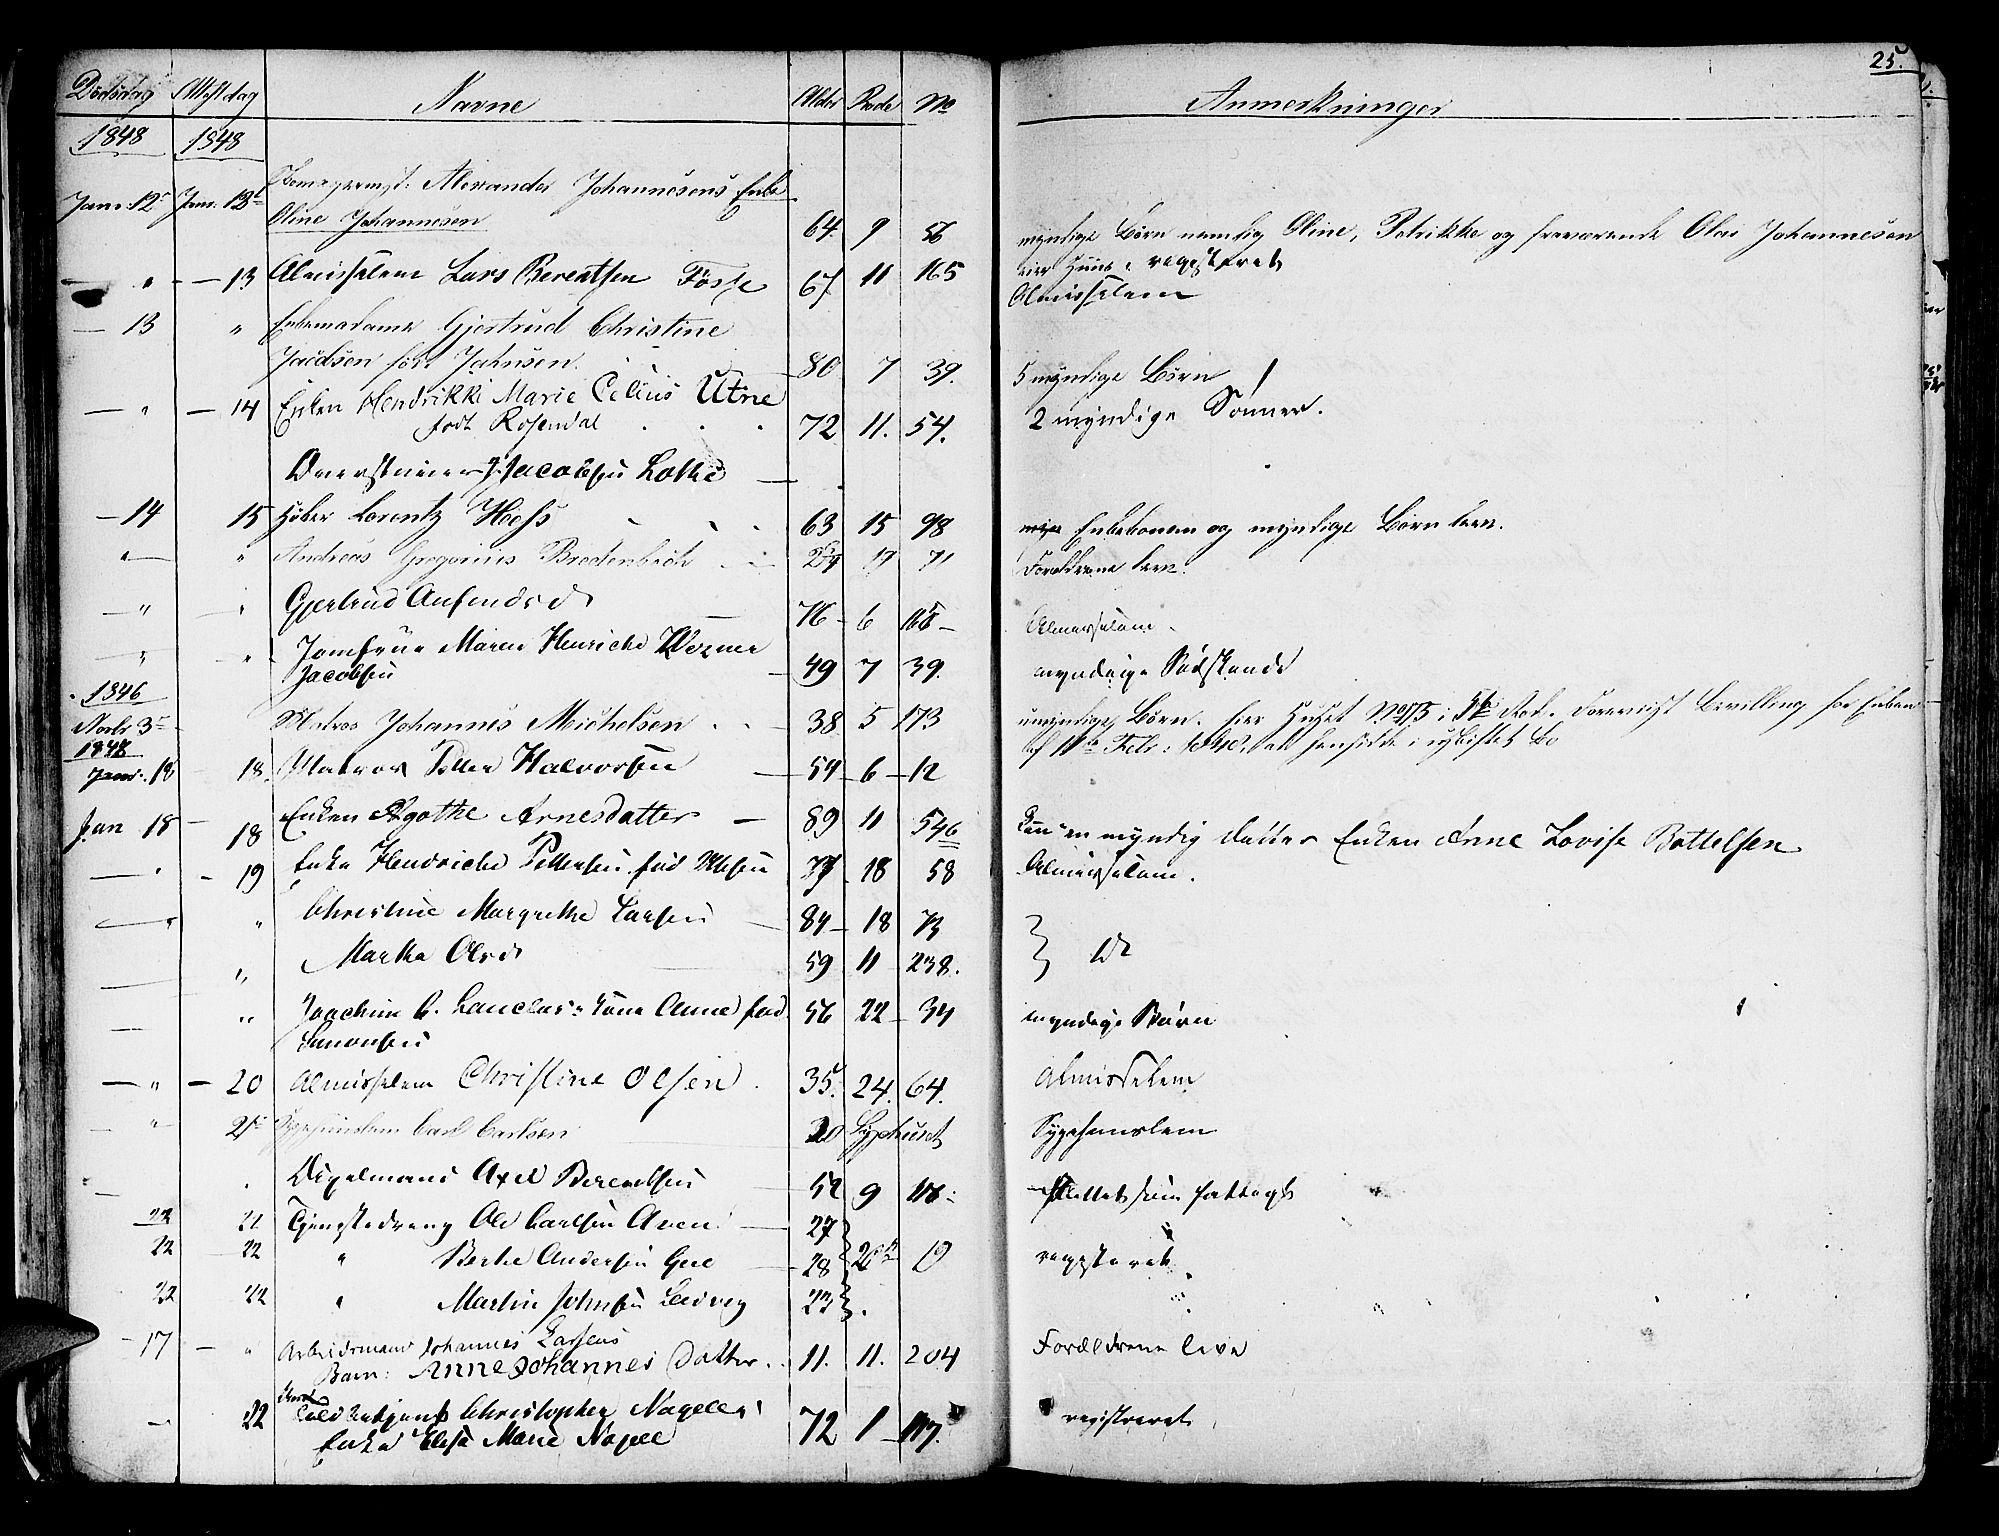 SAB, Byfogd og Byskriver i Bergen, 06/06Na/L0002: Dødsfallsjournaler, 1847-1861, s. 24b-25a